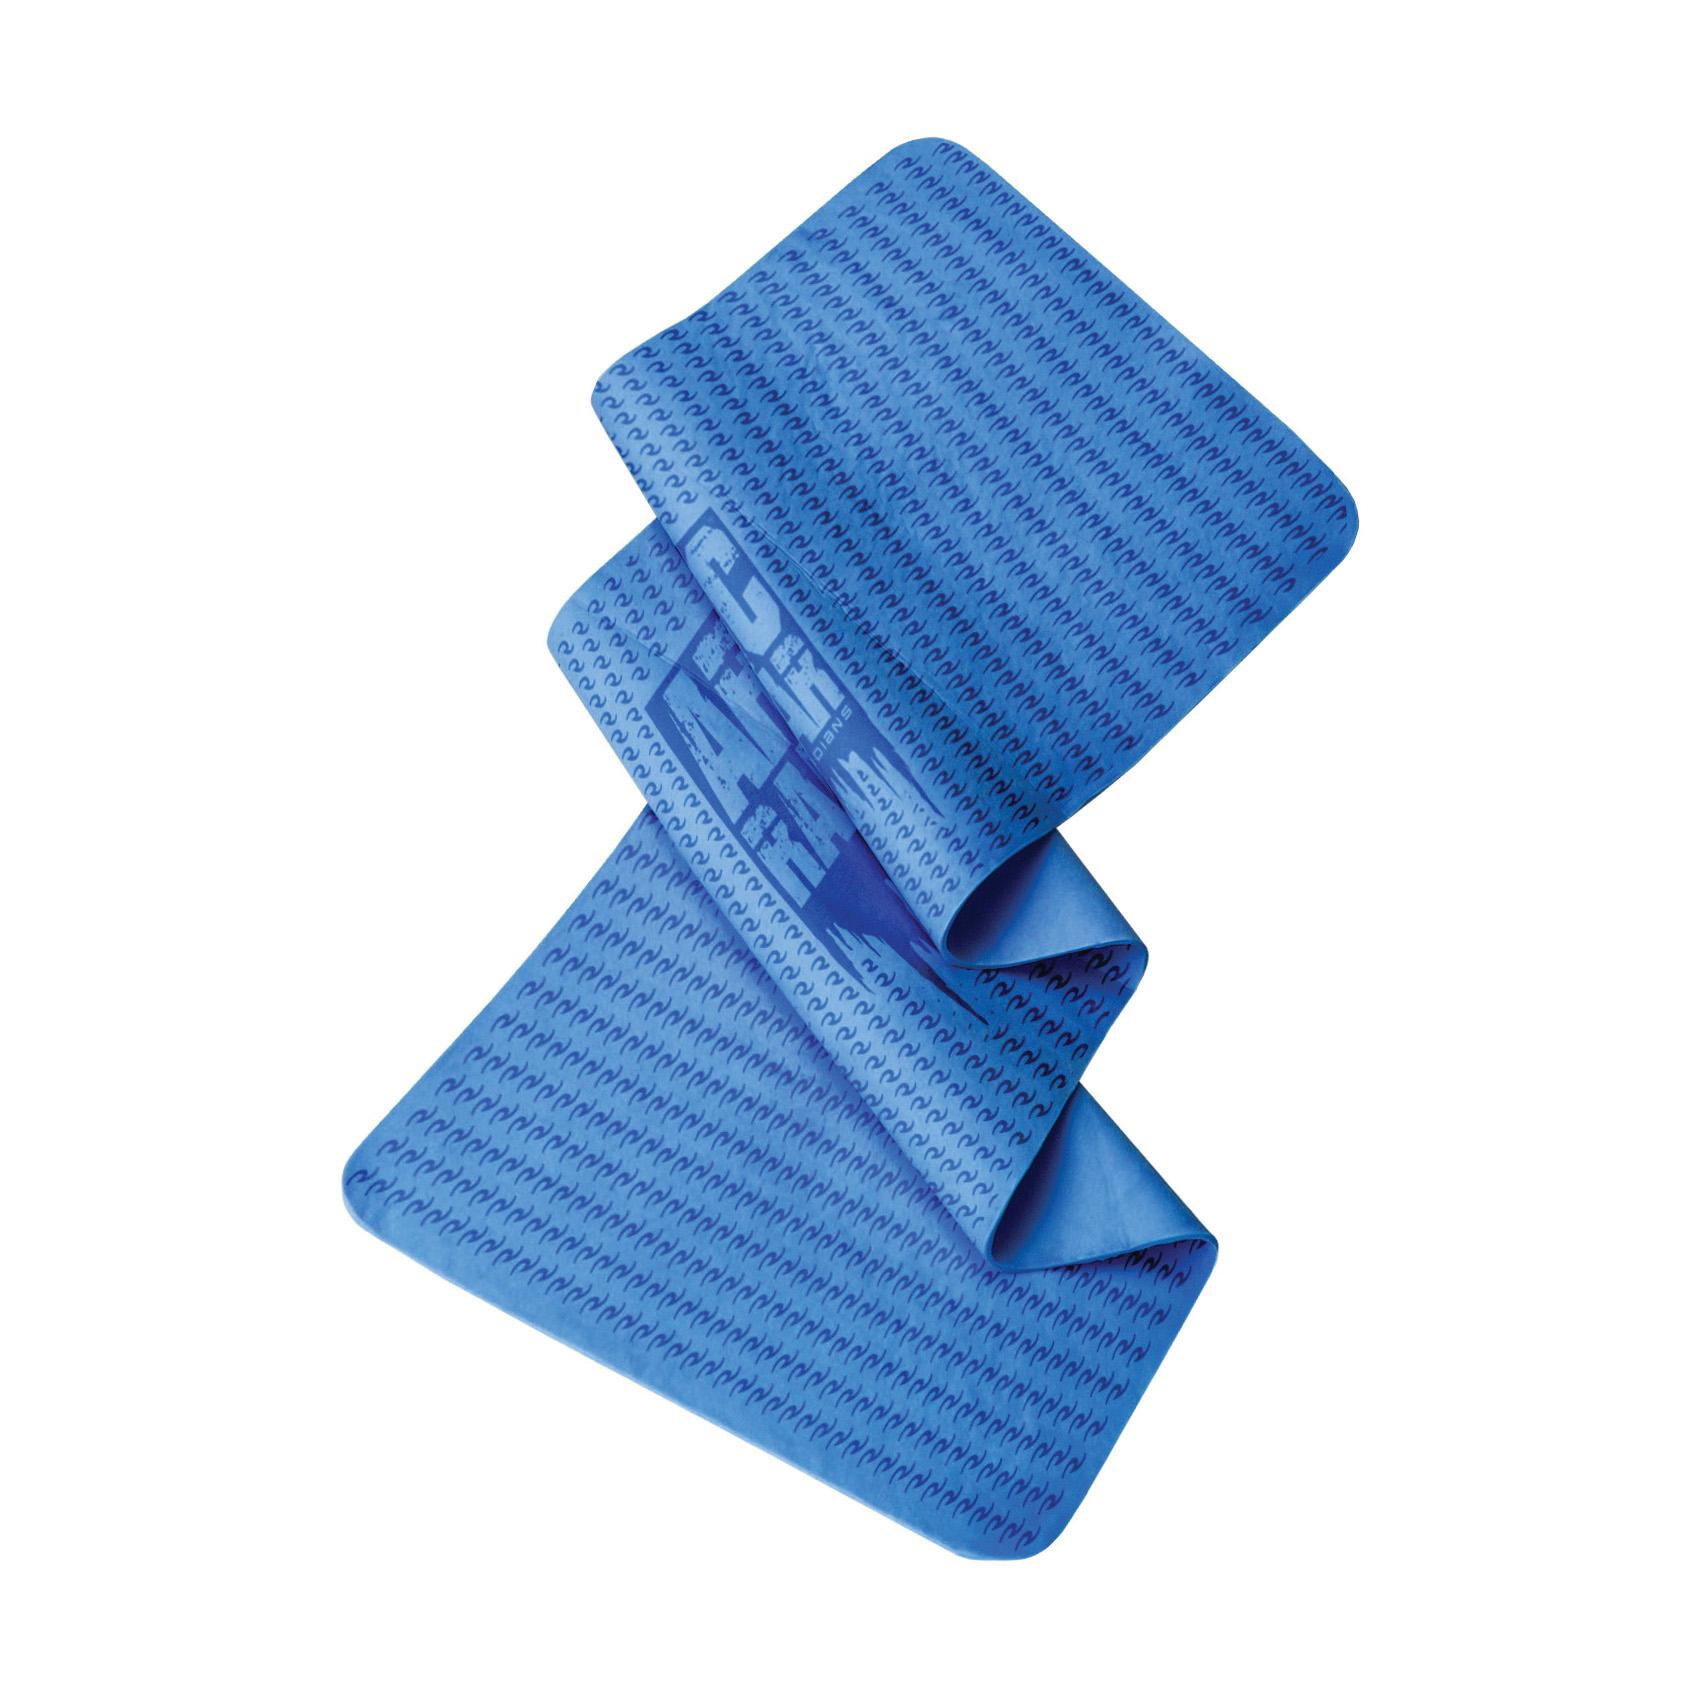 RADWEAR™ RCS308 Cooling Headshade, Universal, Blue Paisley